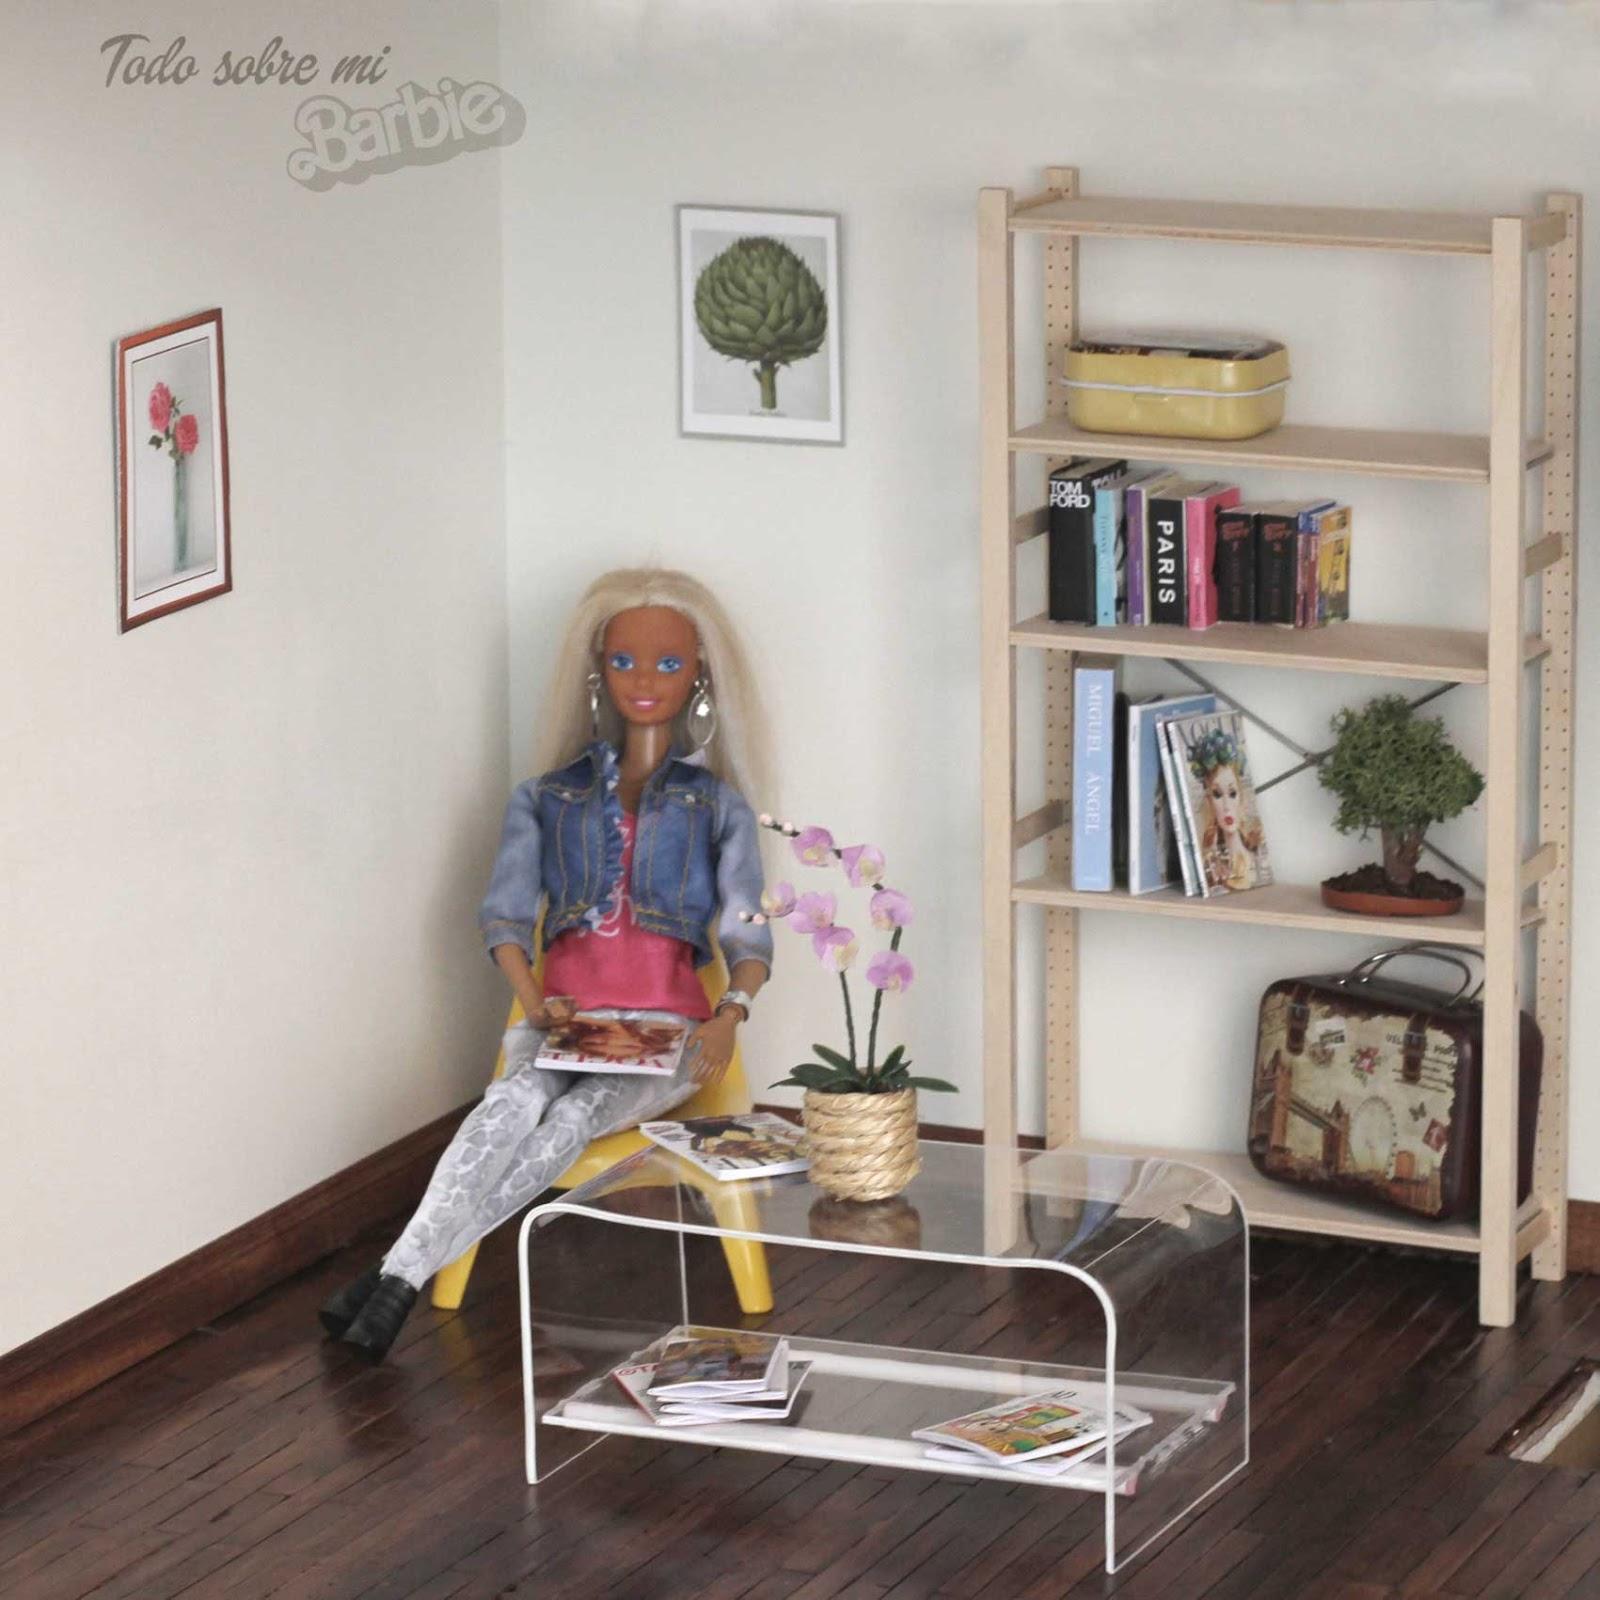 Todo sobre mi barbie mesa de metacrilato - Mesa centro metacrilato ...